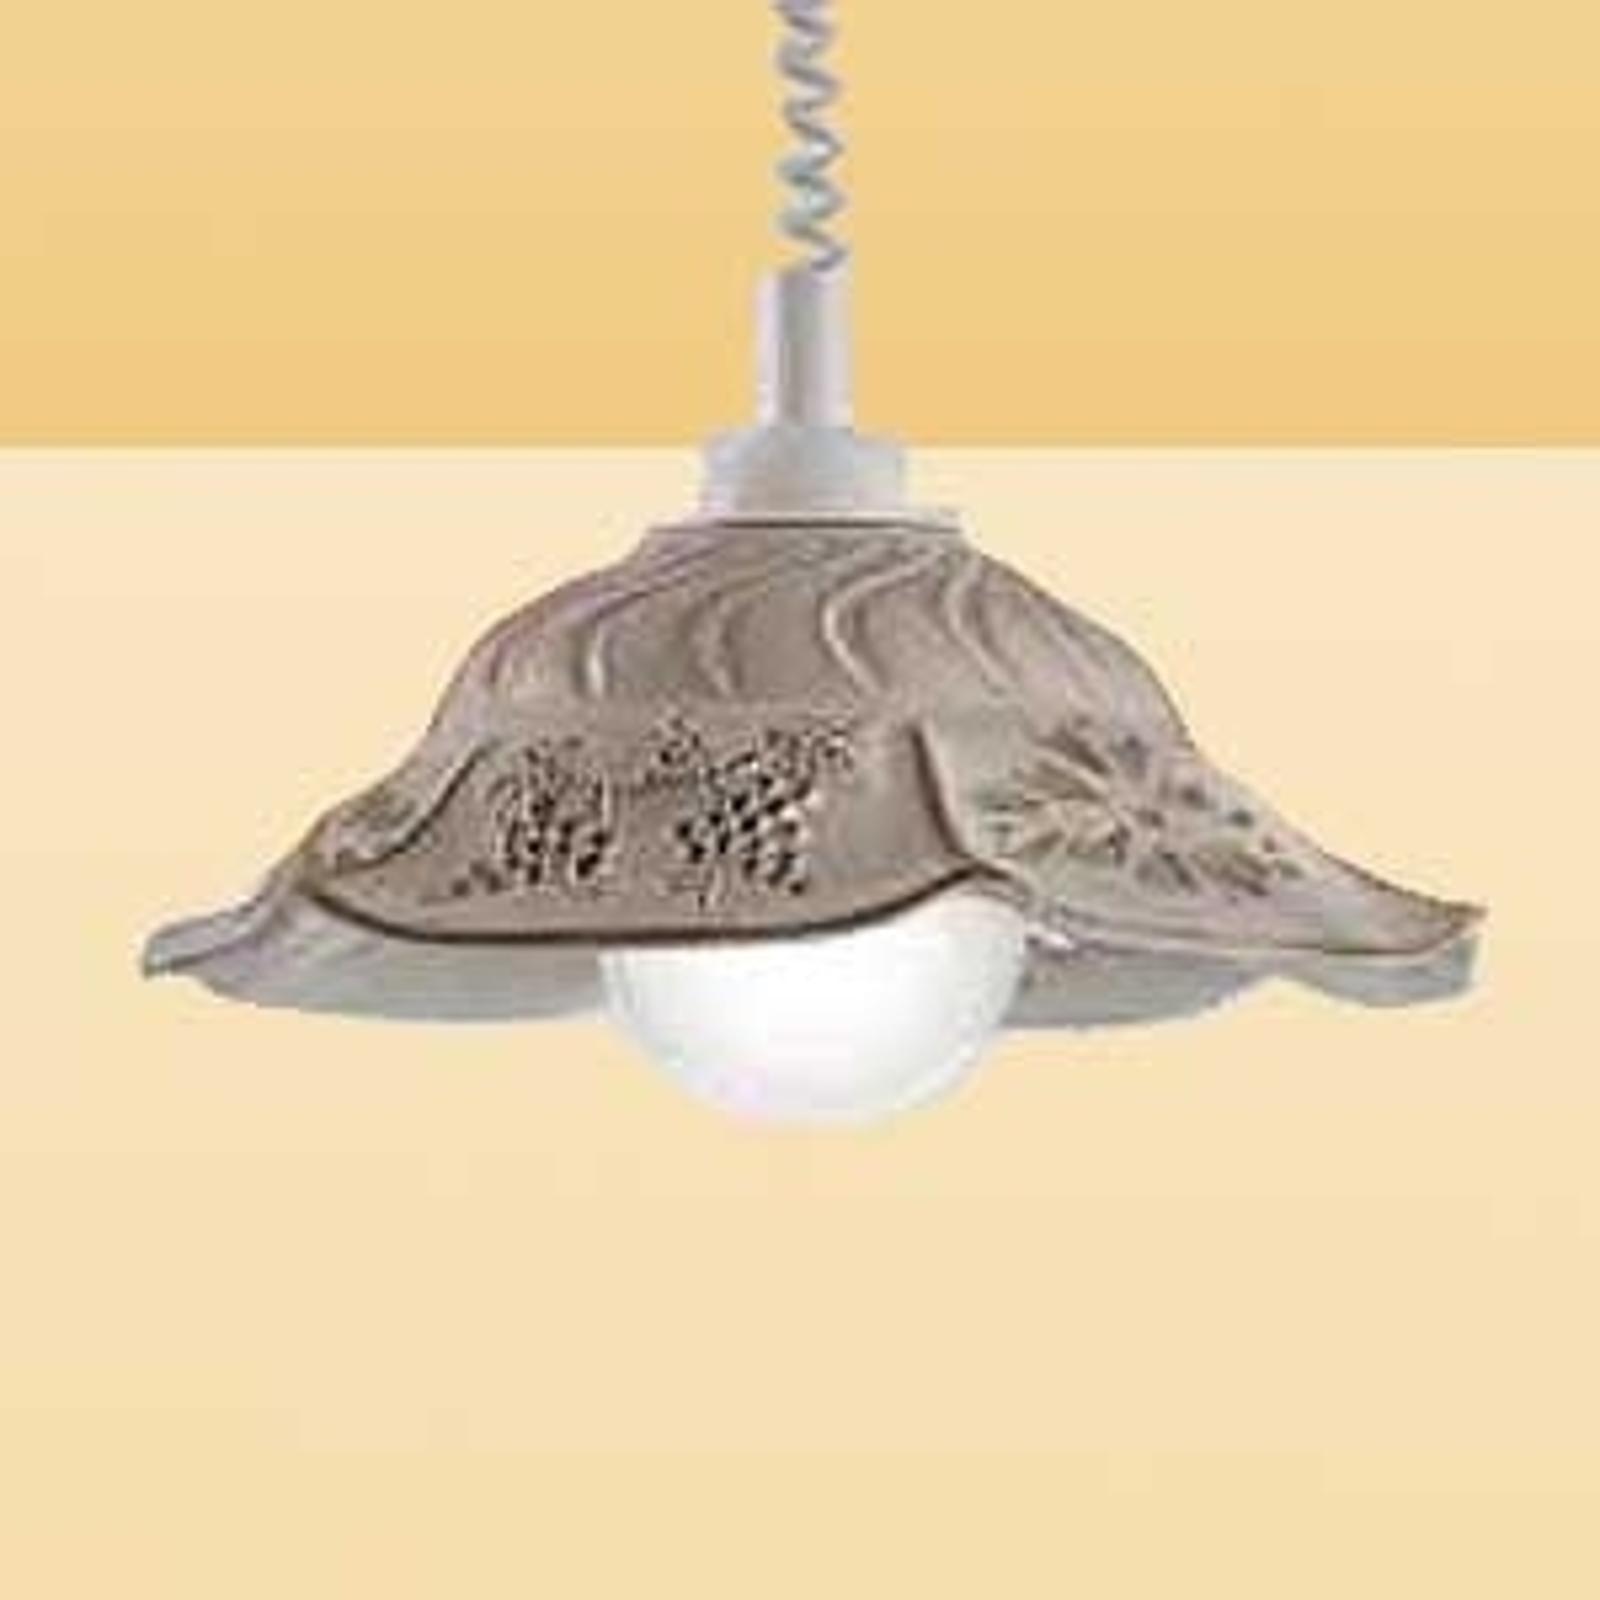 Hanglamp VITELA met rustieke uitstraling